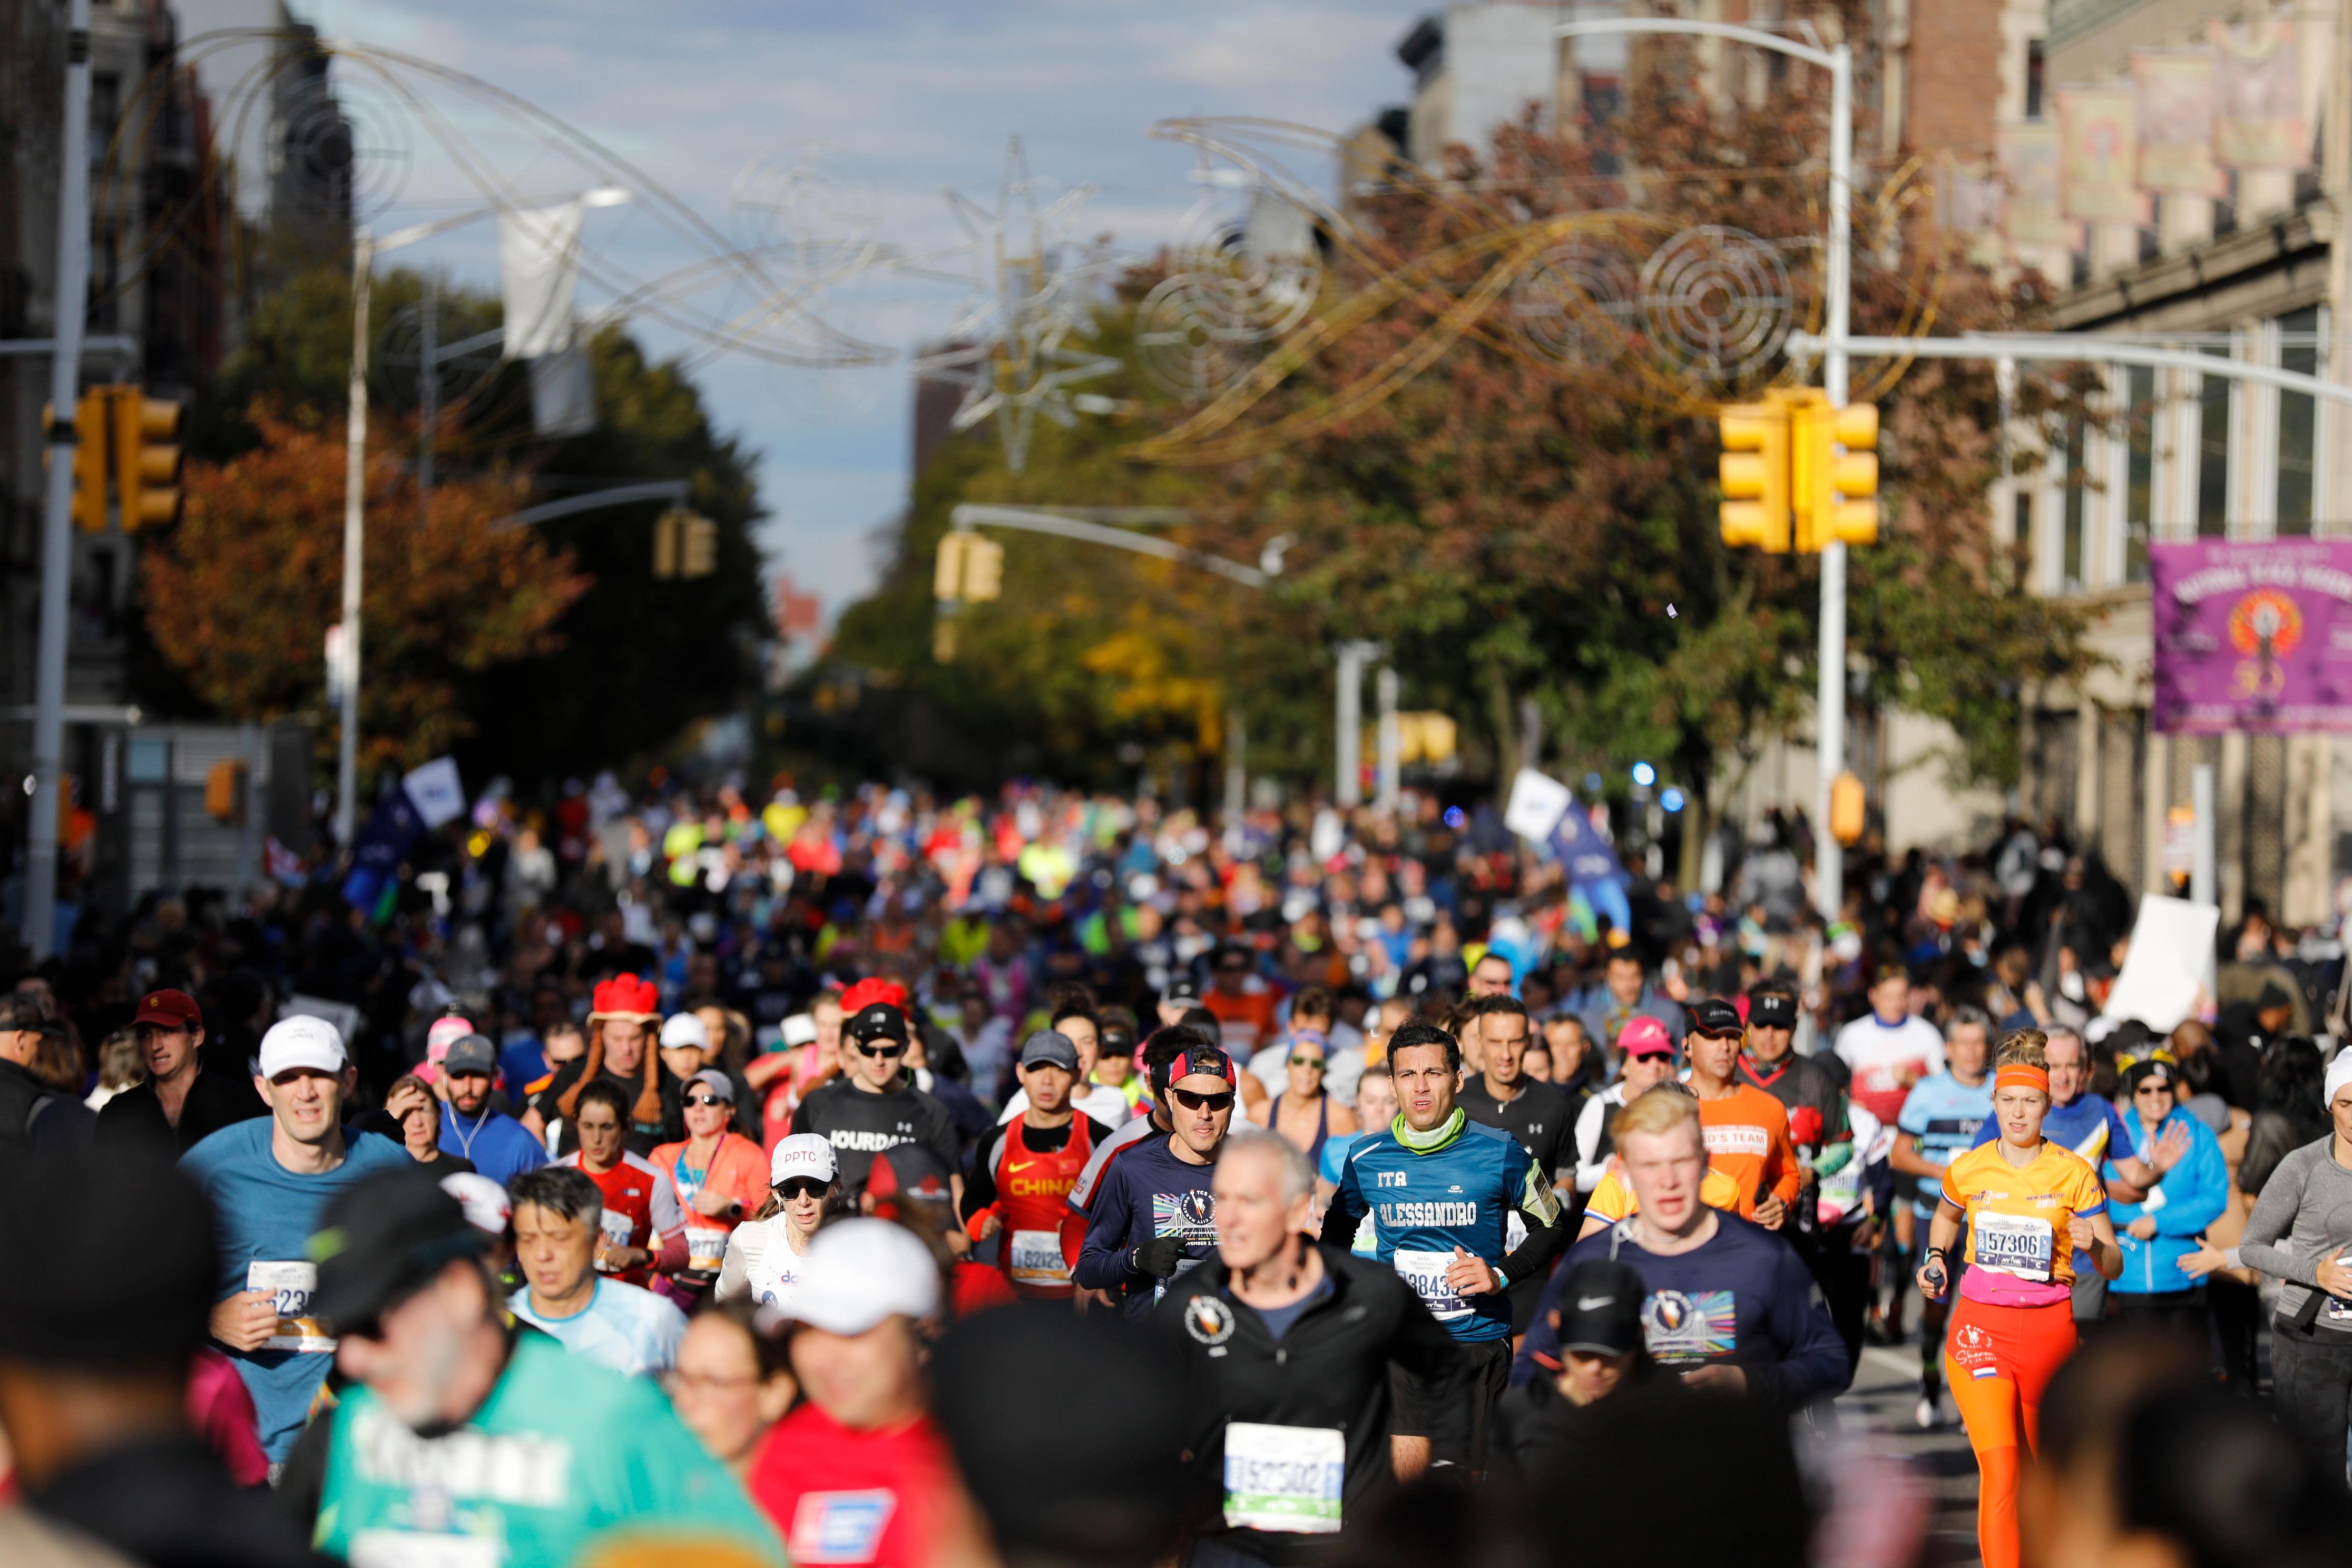 Runners on 2019 TCS New York City Marathon course